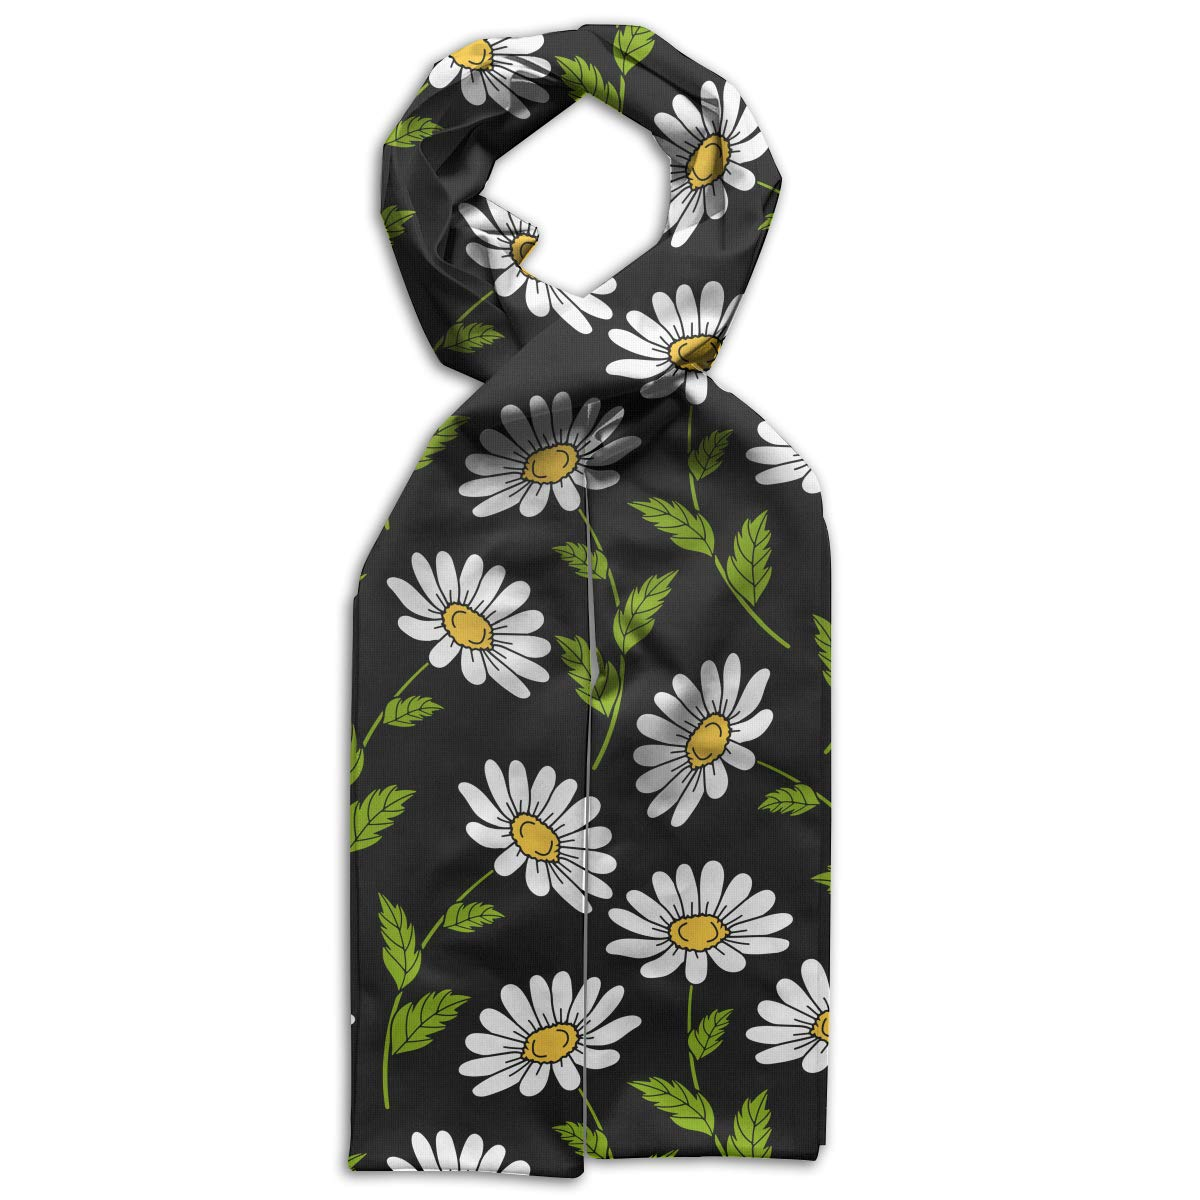 GQOP Kids Scarf Daisy Flower Lightweight Long Scarf Shawl Warps